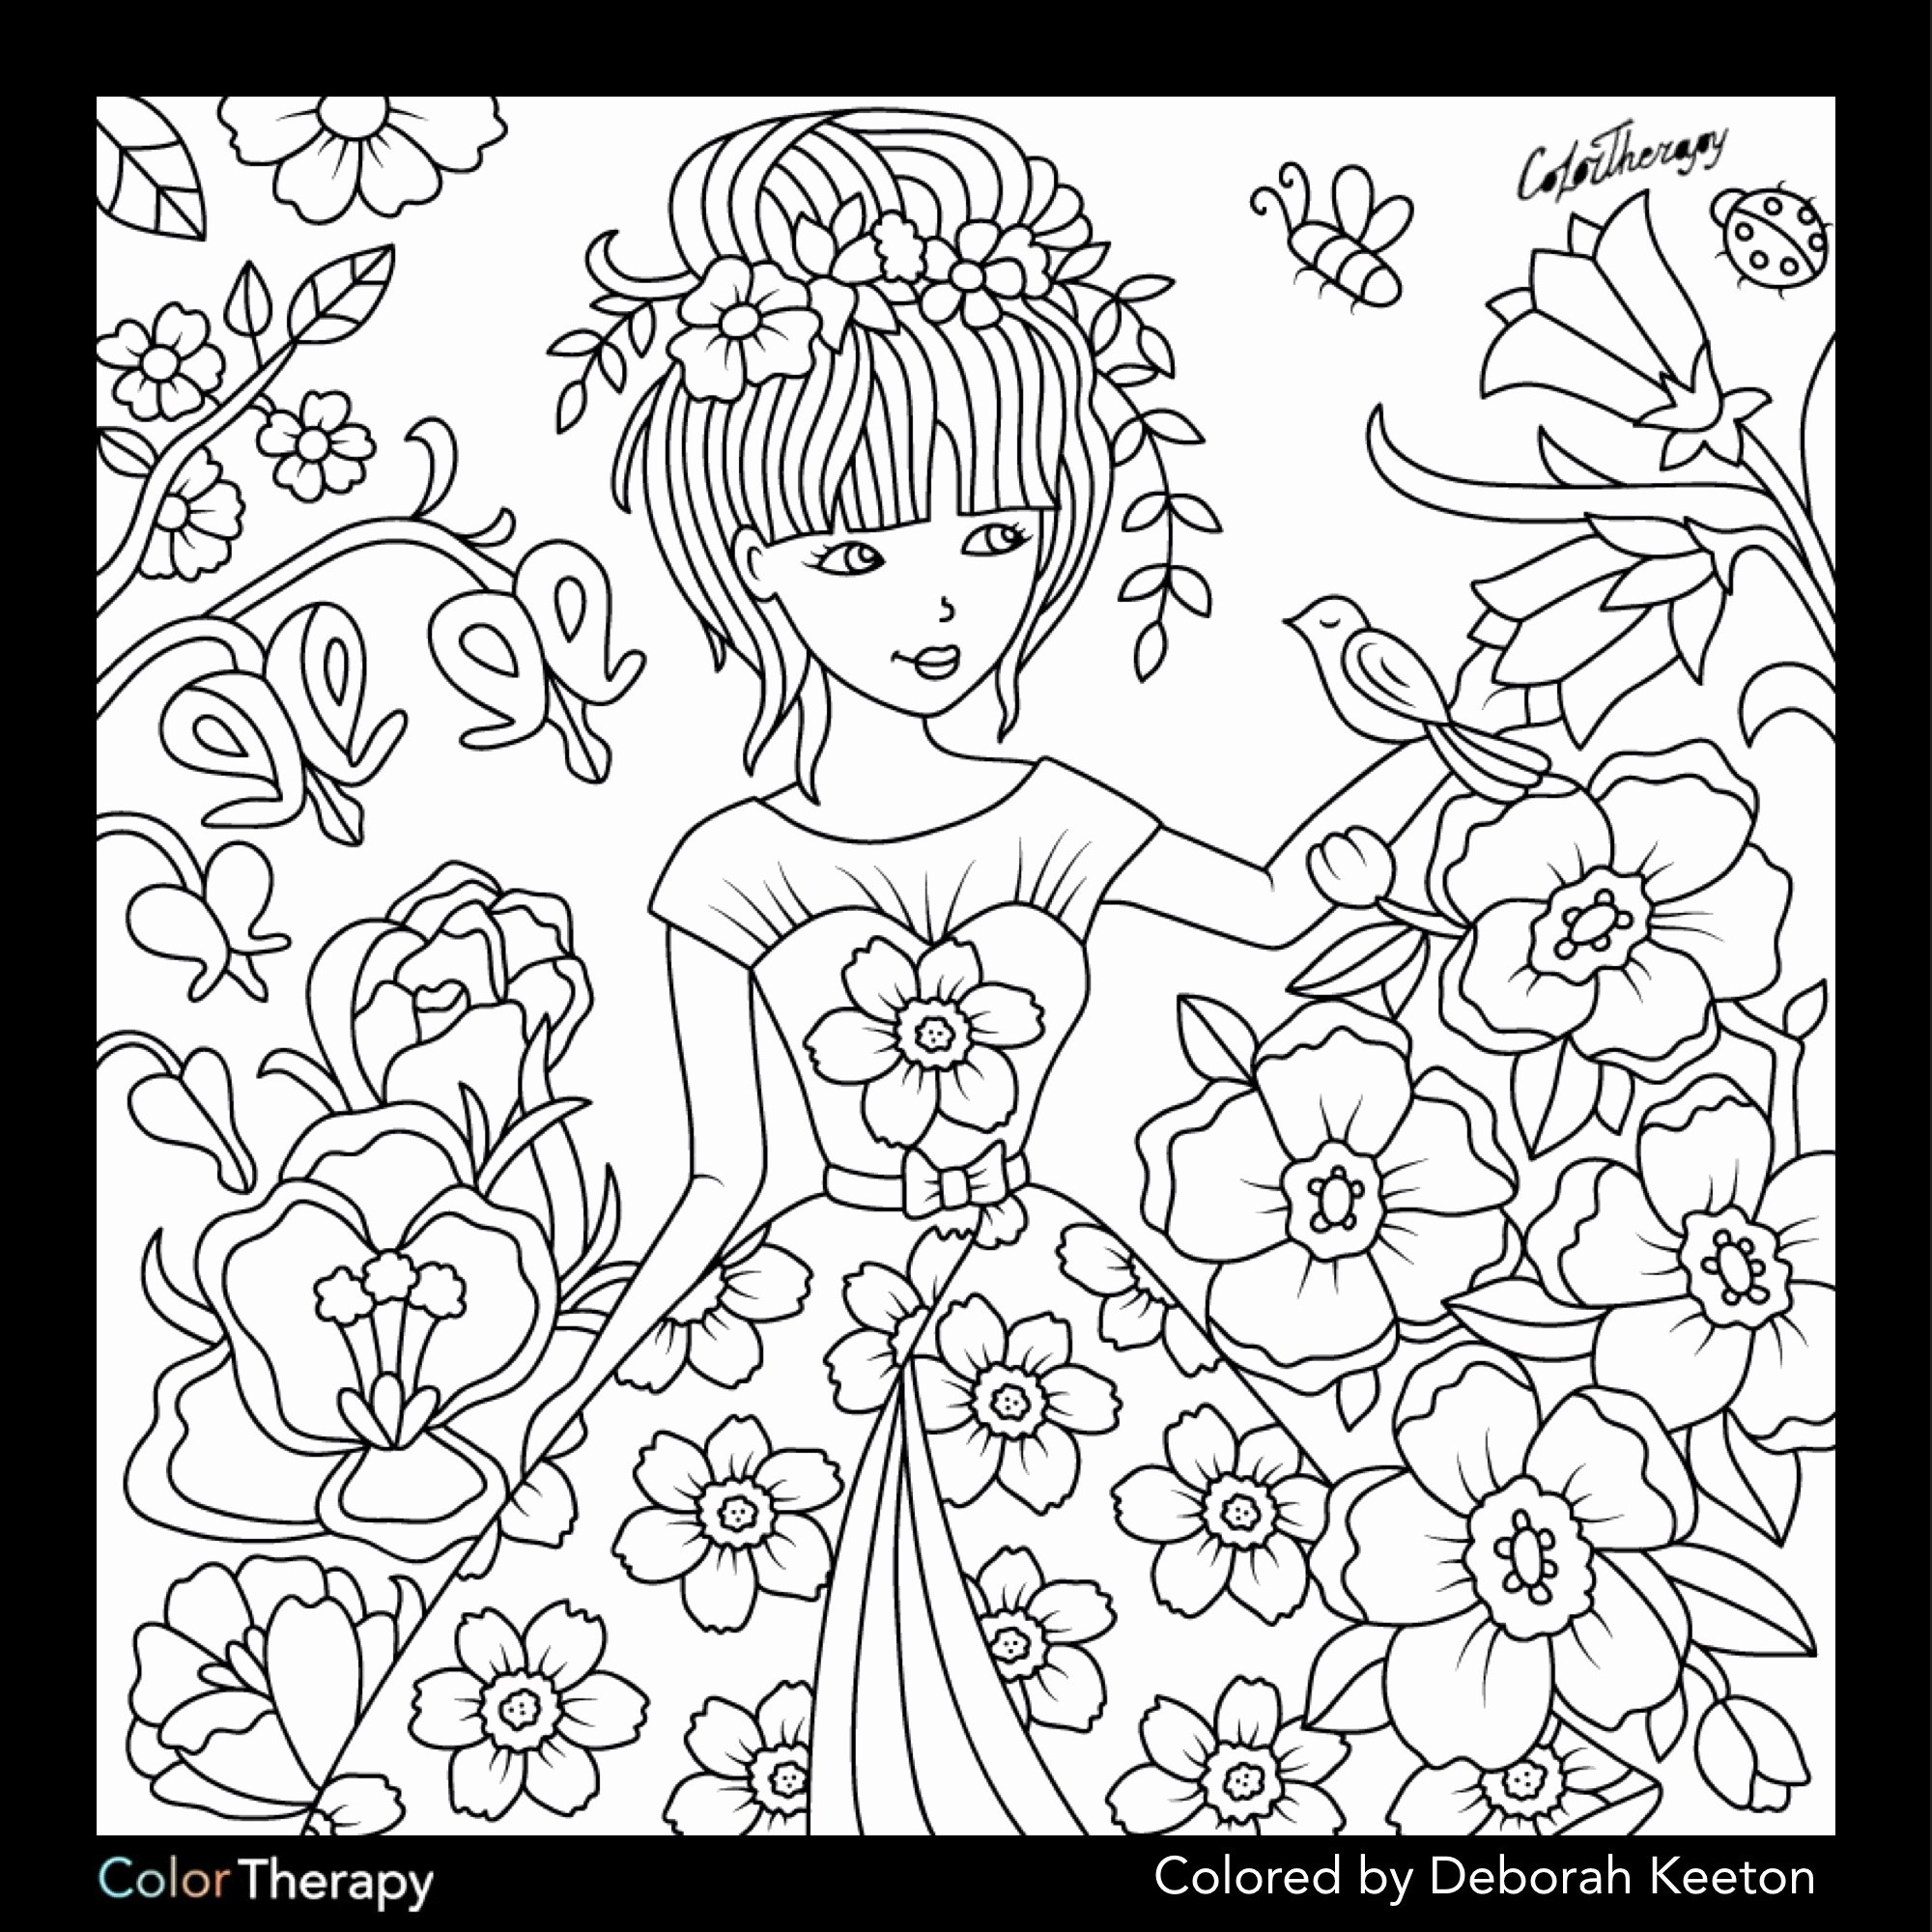 Ausmalbilder Disney Vaiana Einzigartig 24 Moana Coloring Pages Disney Gallery Coloring Sheets Bilder